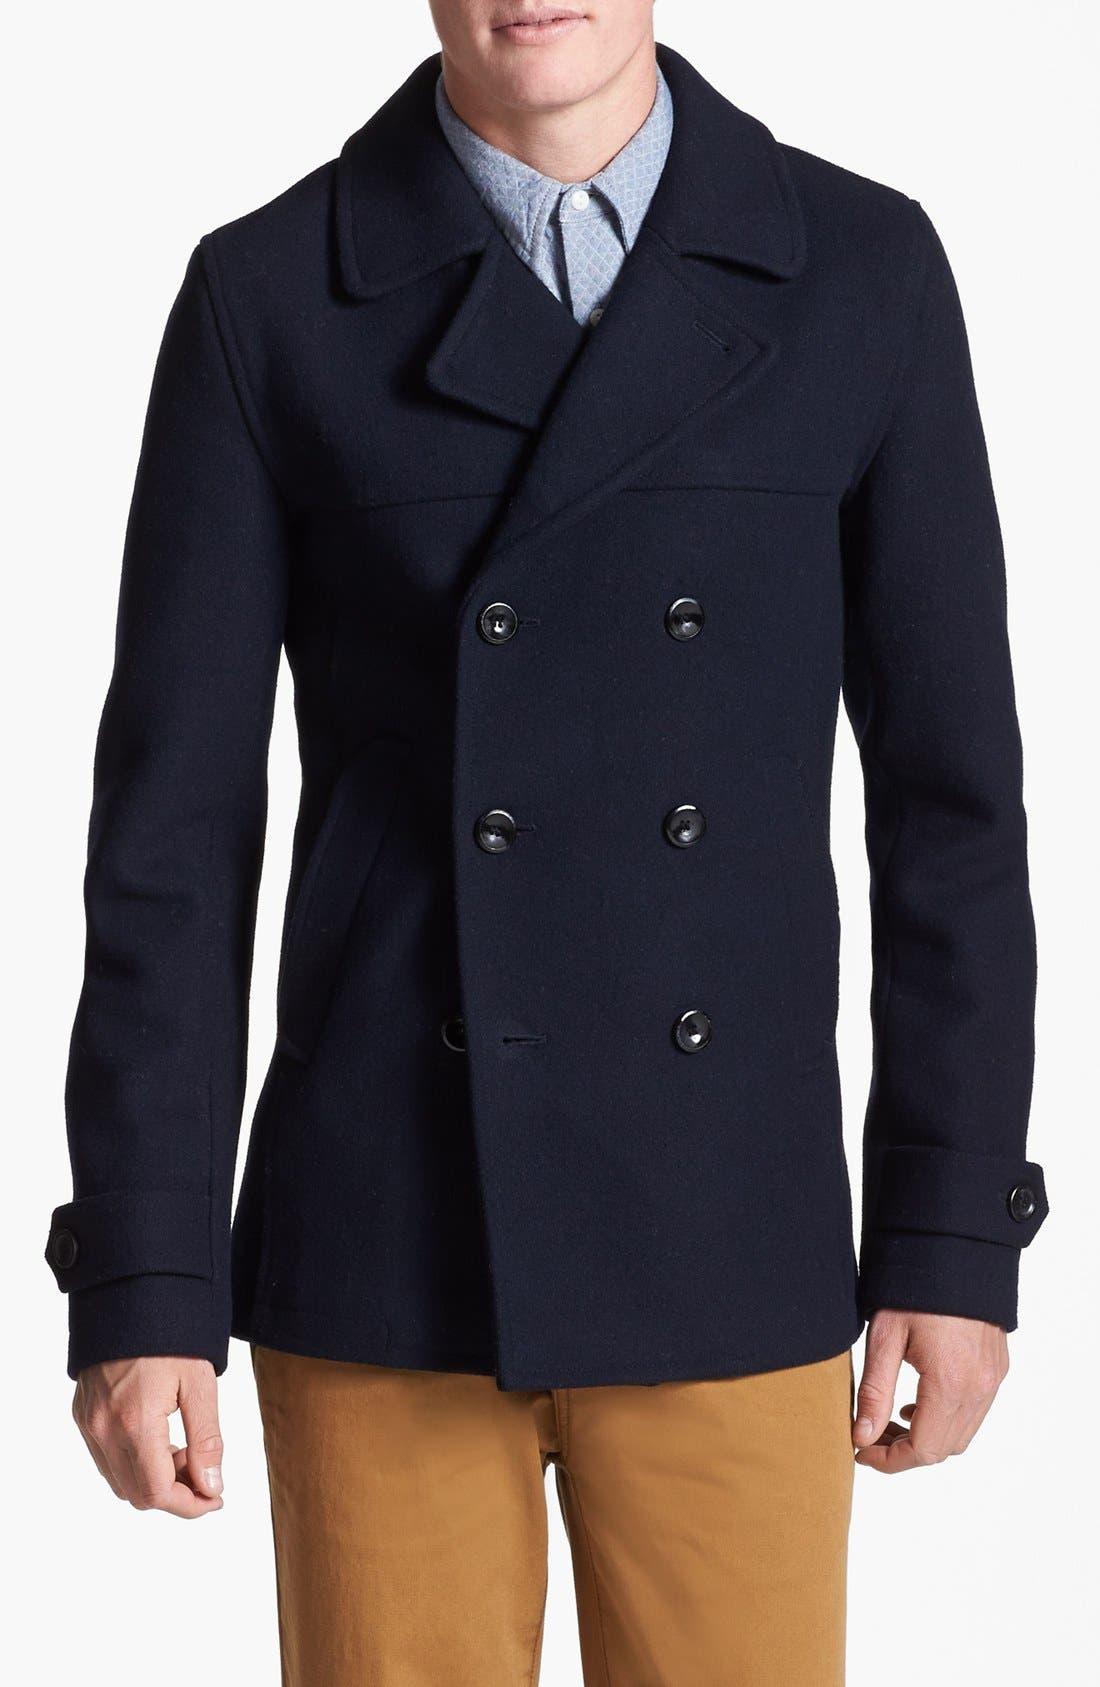 Alternate Image 1 Selected - Topman Skinny Fit Double Breasted Wool Blend Peacoat